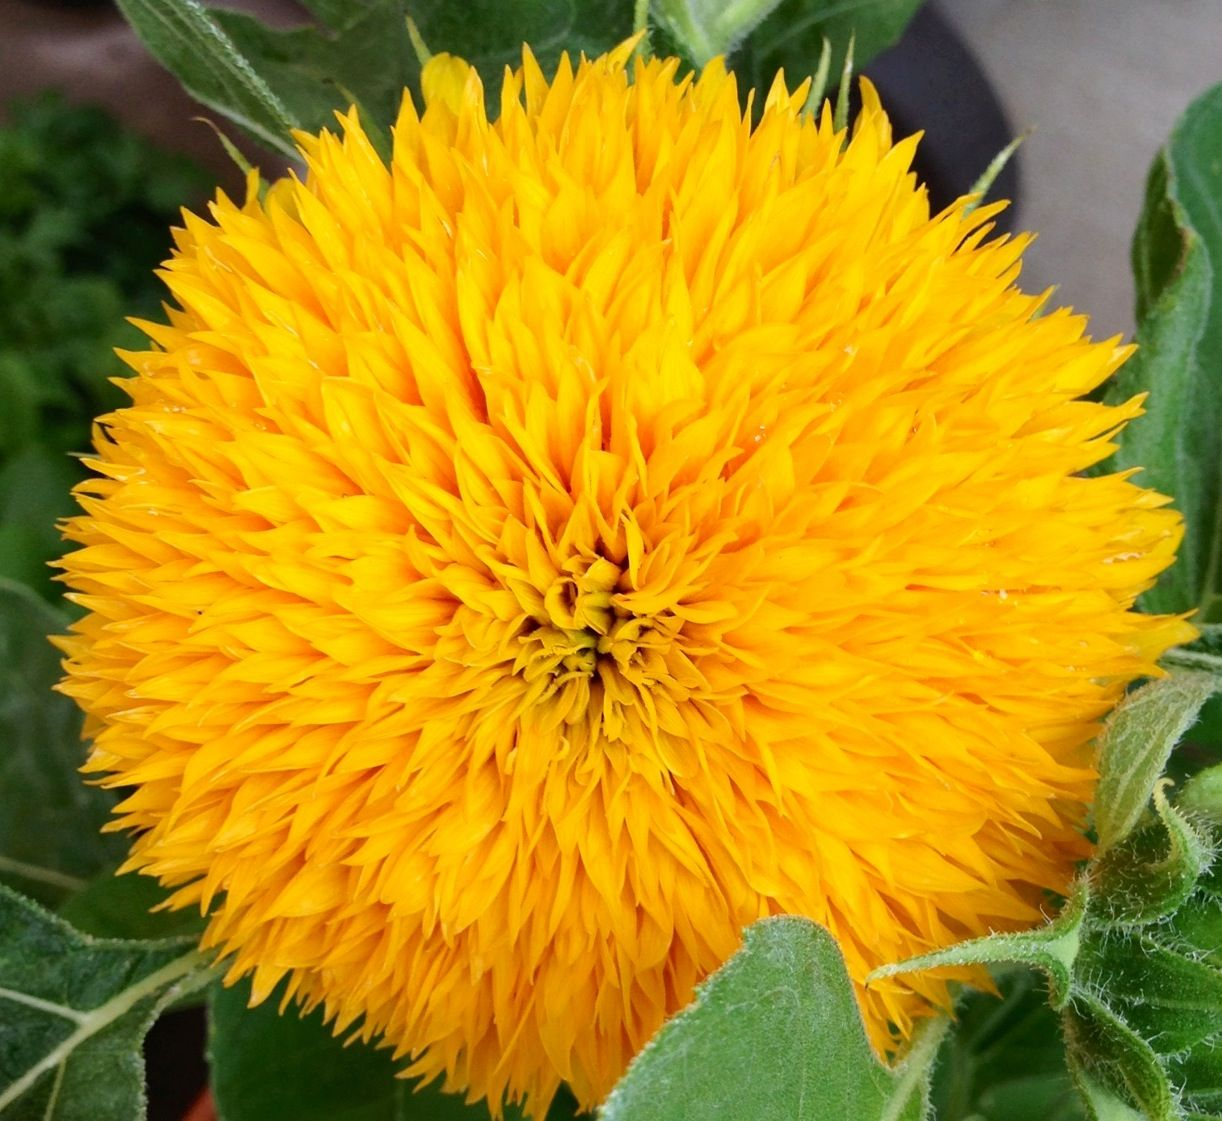 My favorite sunflower!